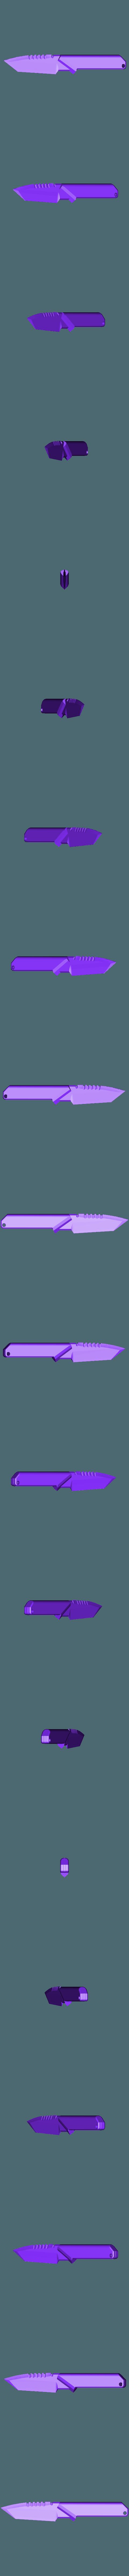 Couteau Custom.STL Download STL file COUTEAU CUSTOM • 3D printer model, 3dprintcreation